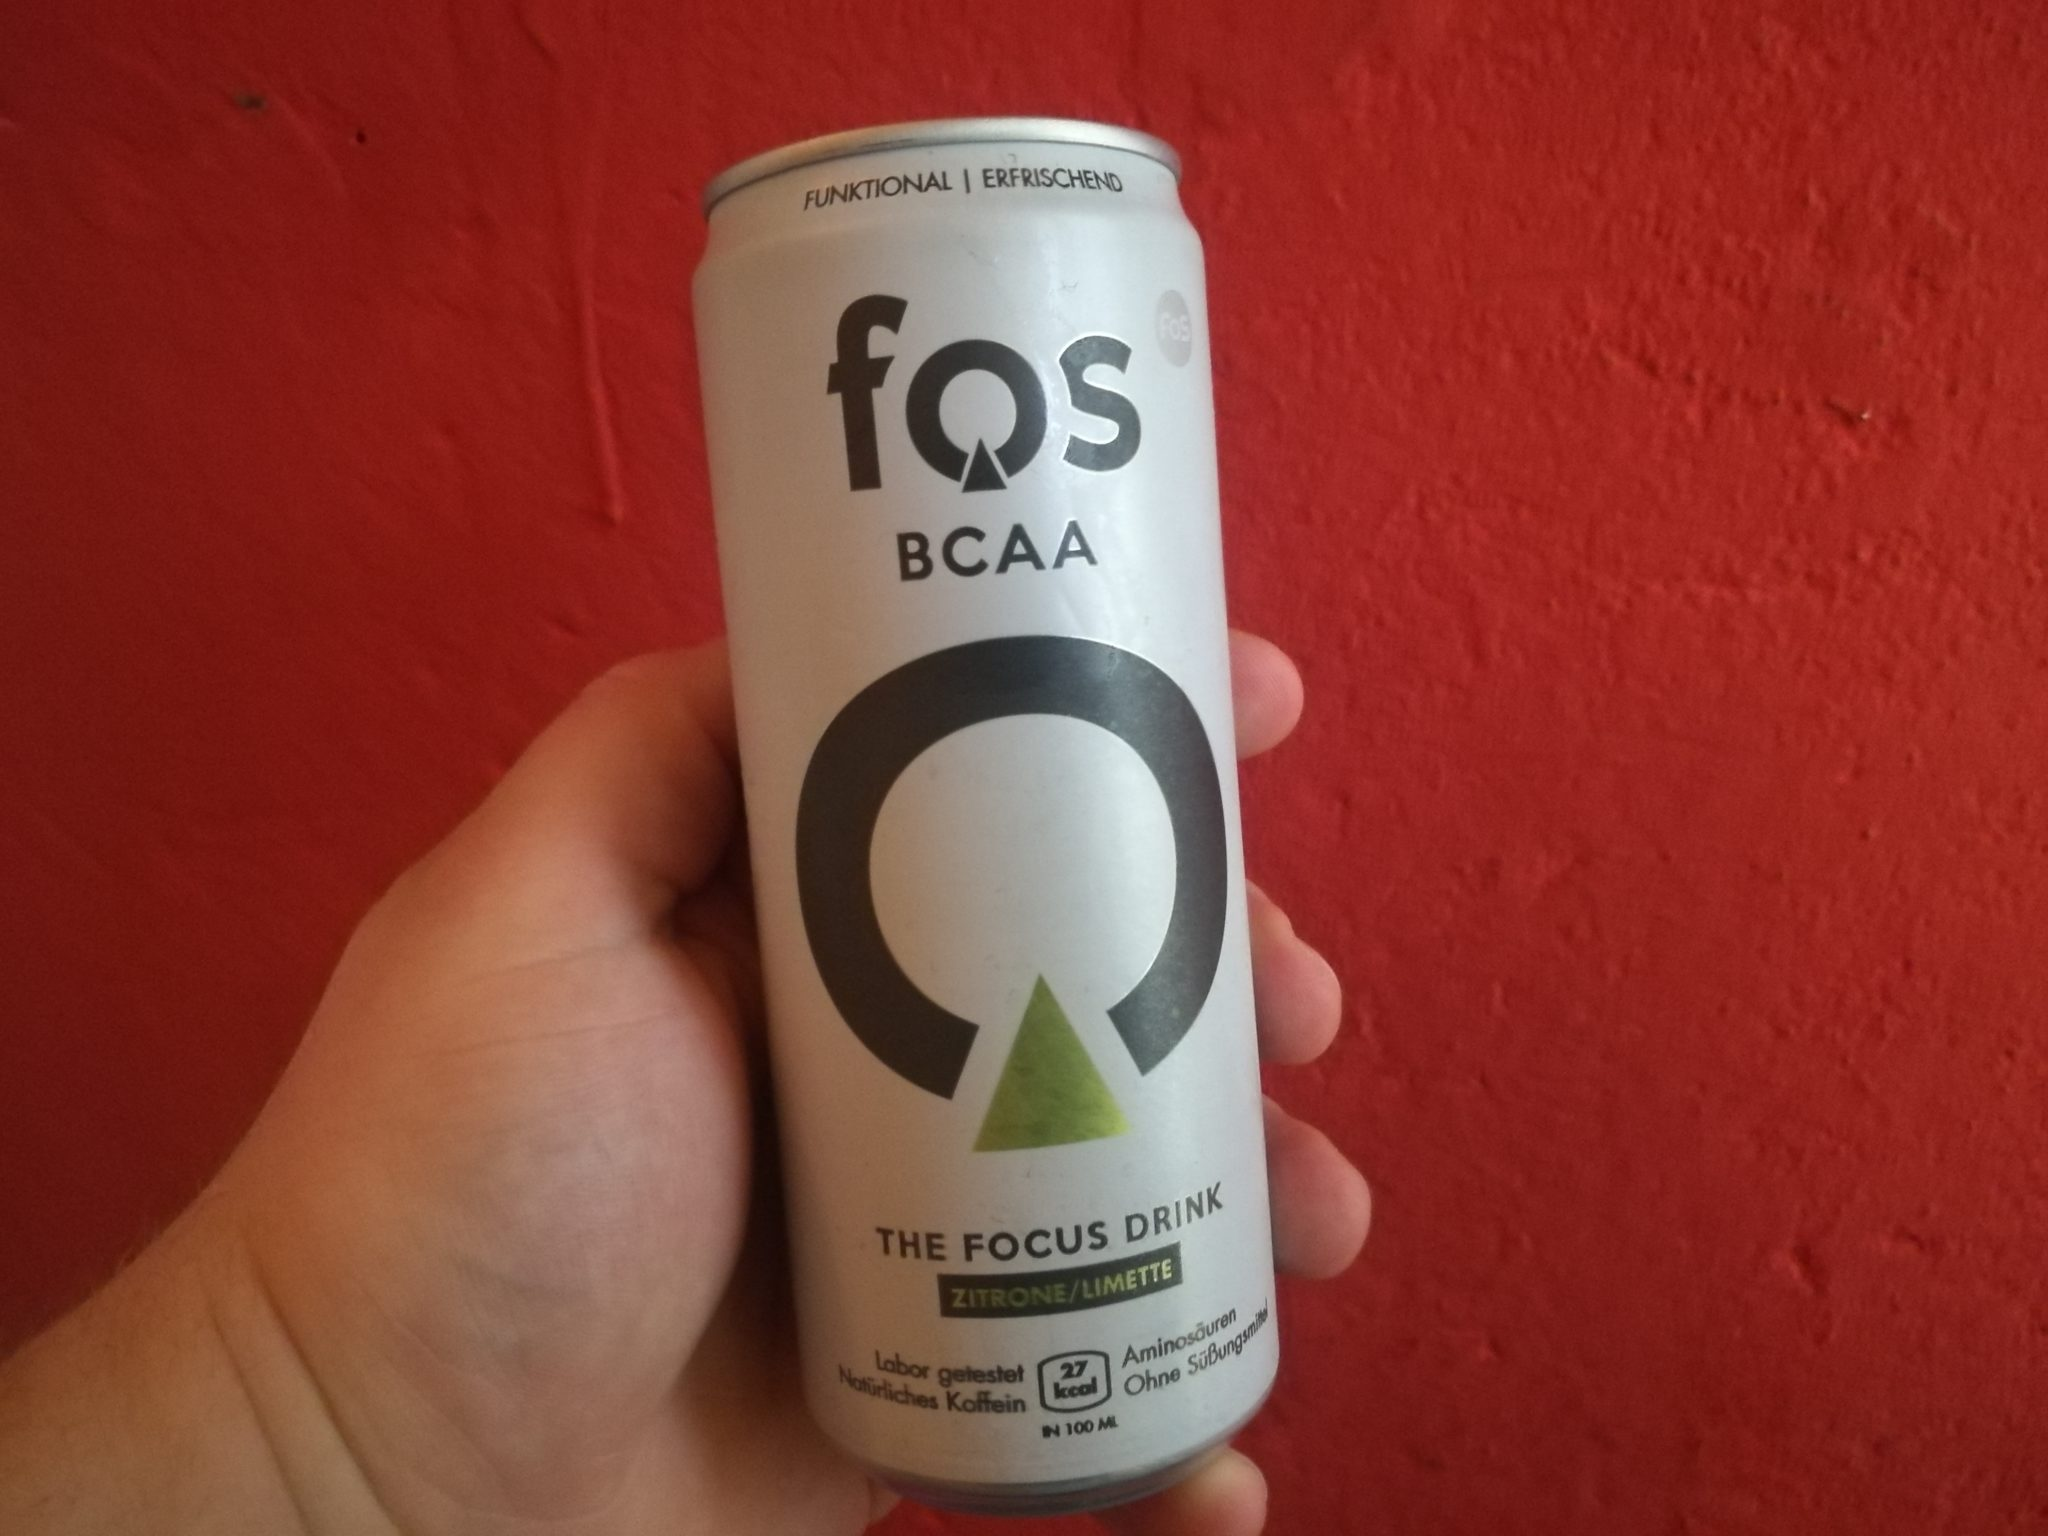 fos BCAA Drink